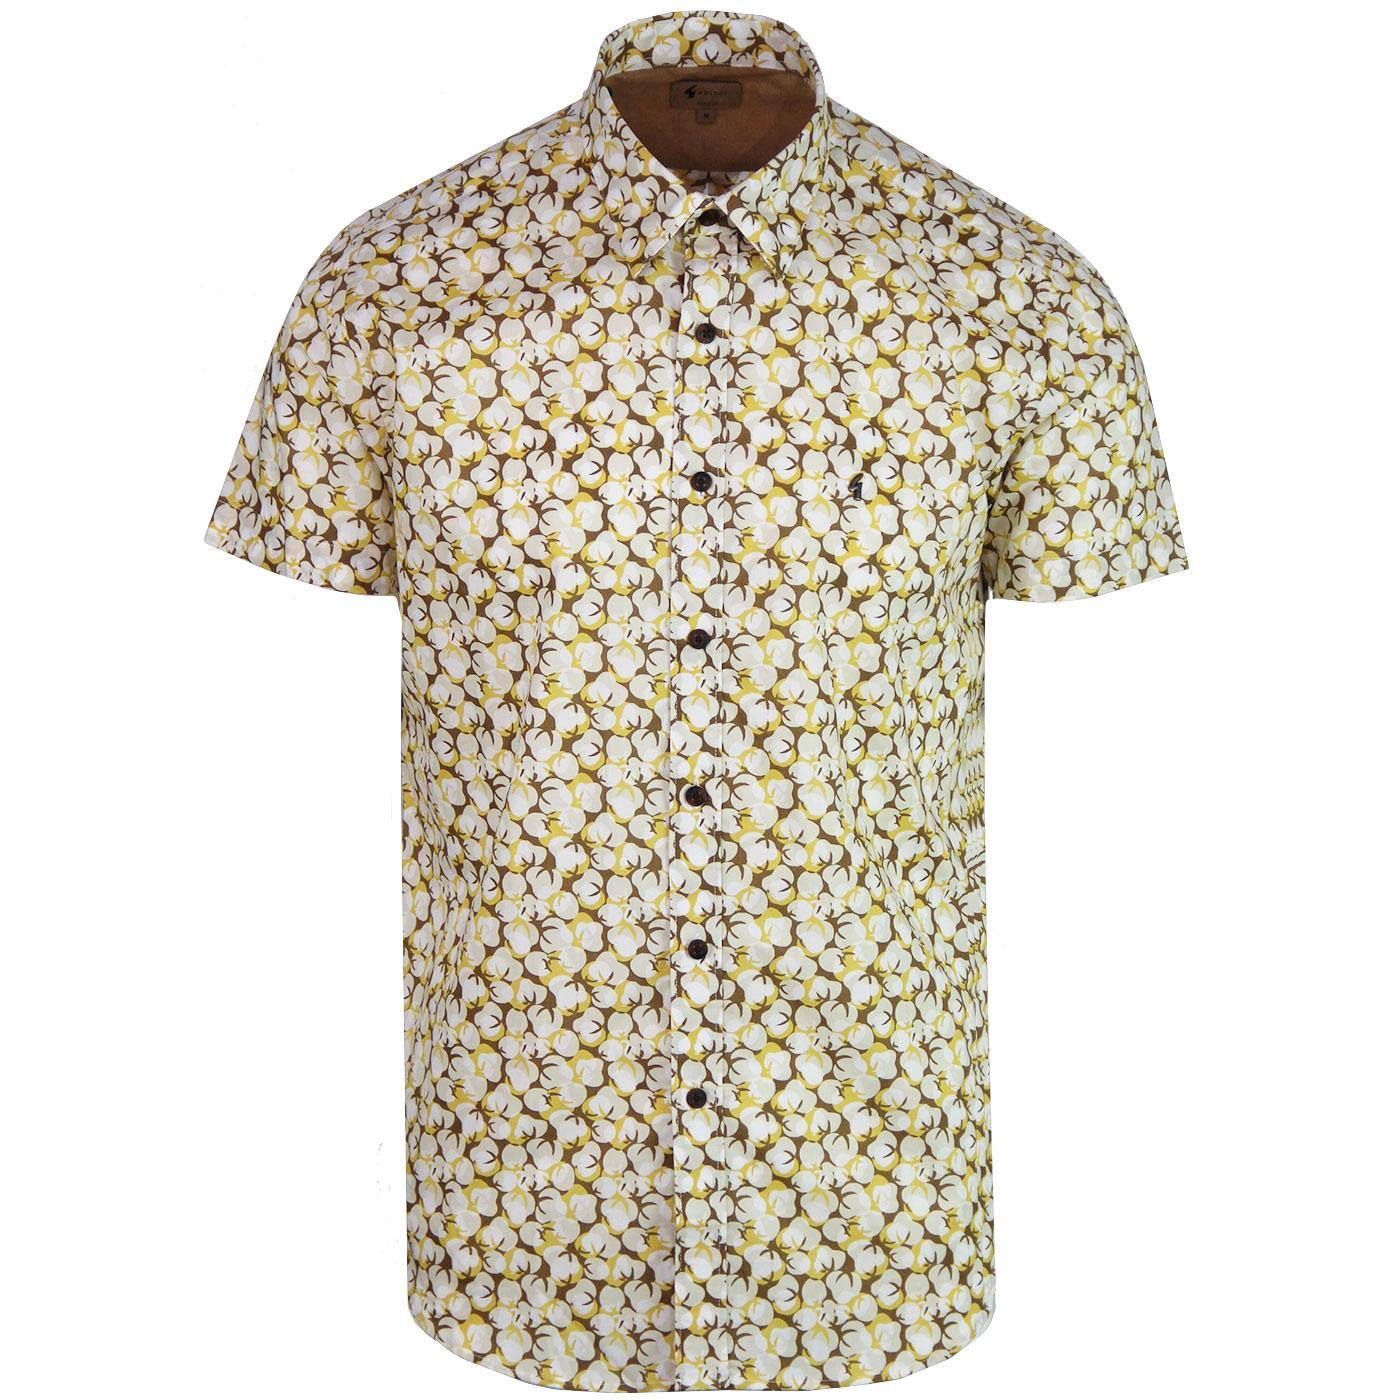 Ashmore GABICCI VINTAGE Retro 70s Popcorn Shirt